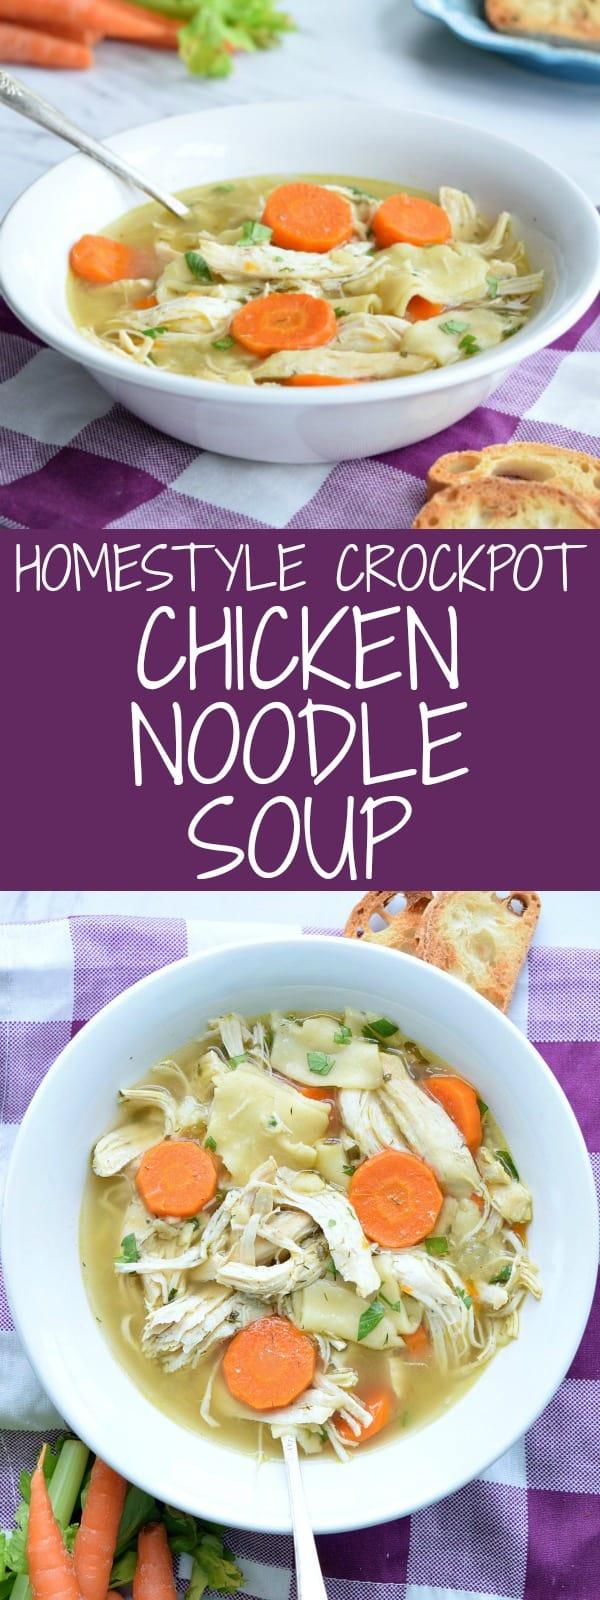 Honestly Crockpot Chicken Noodle Soup